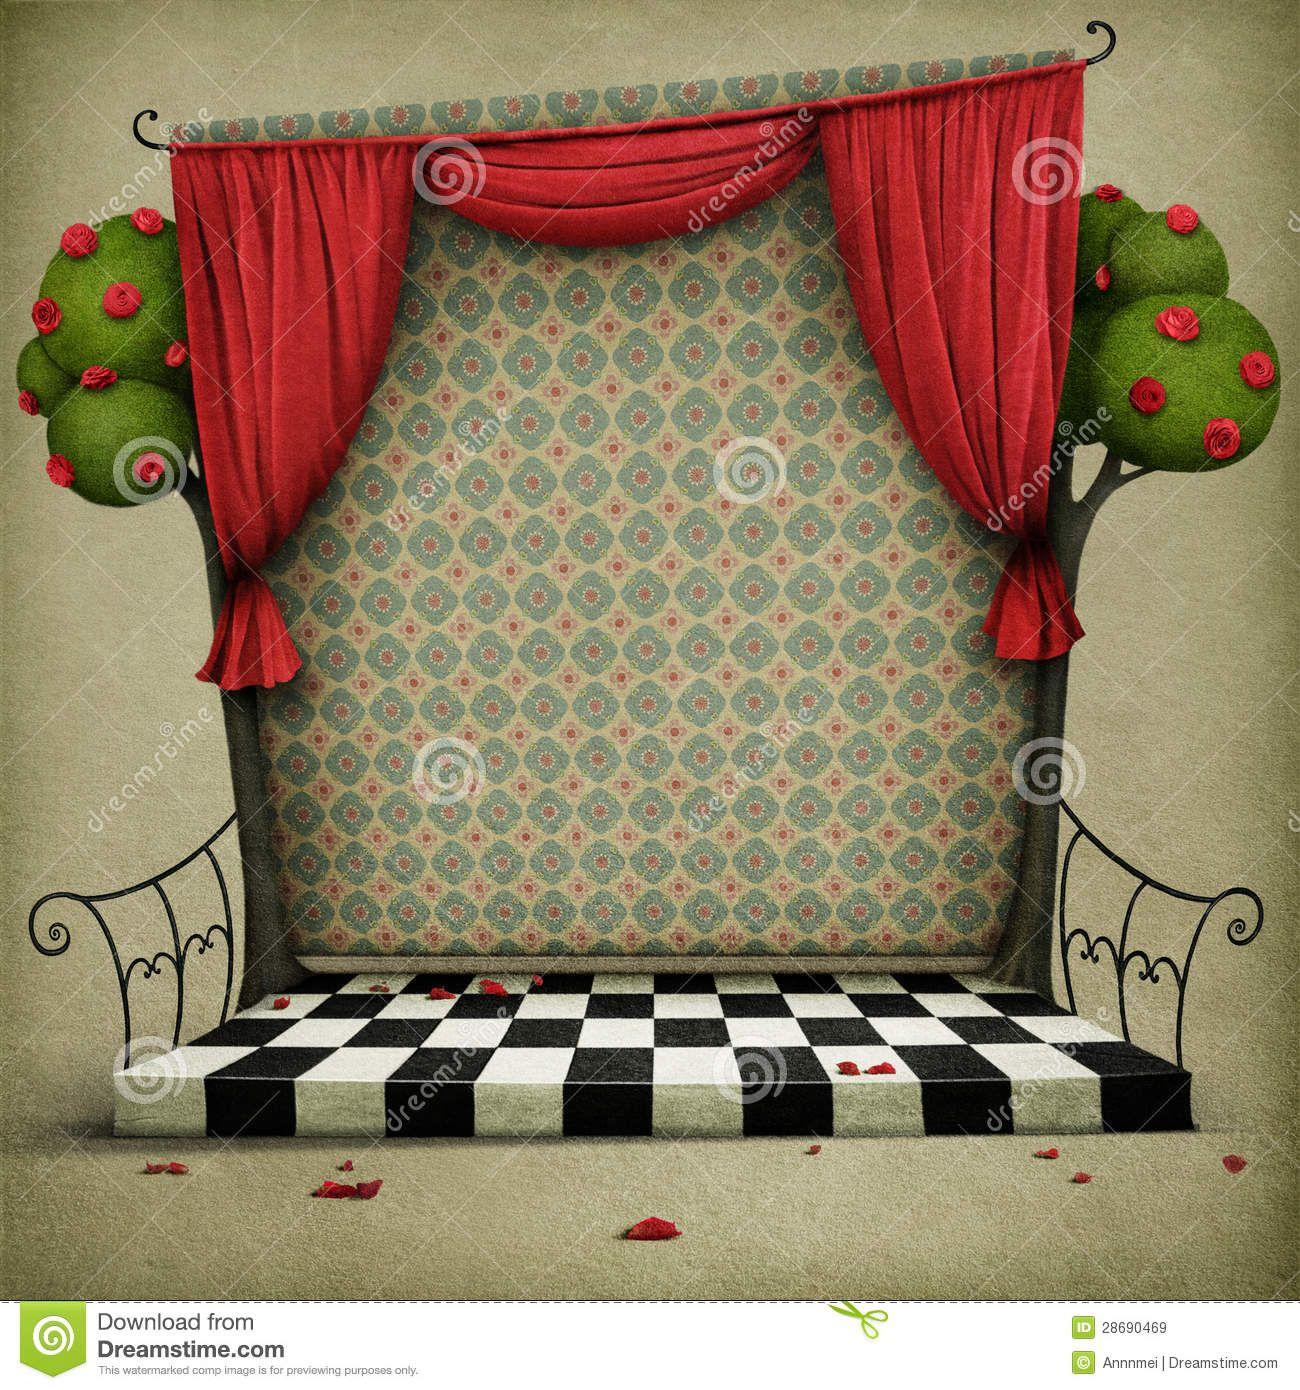 Alice In Wonderland Free Signup